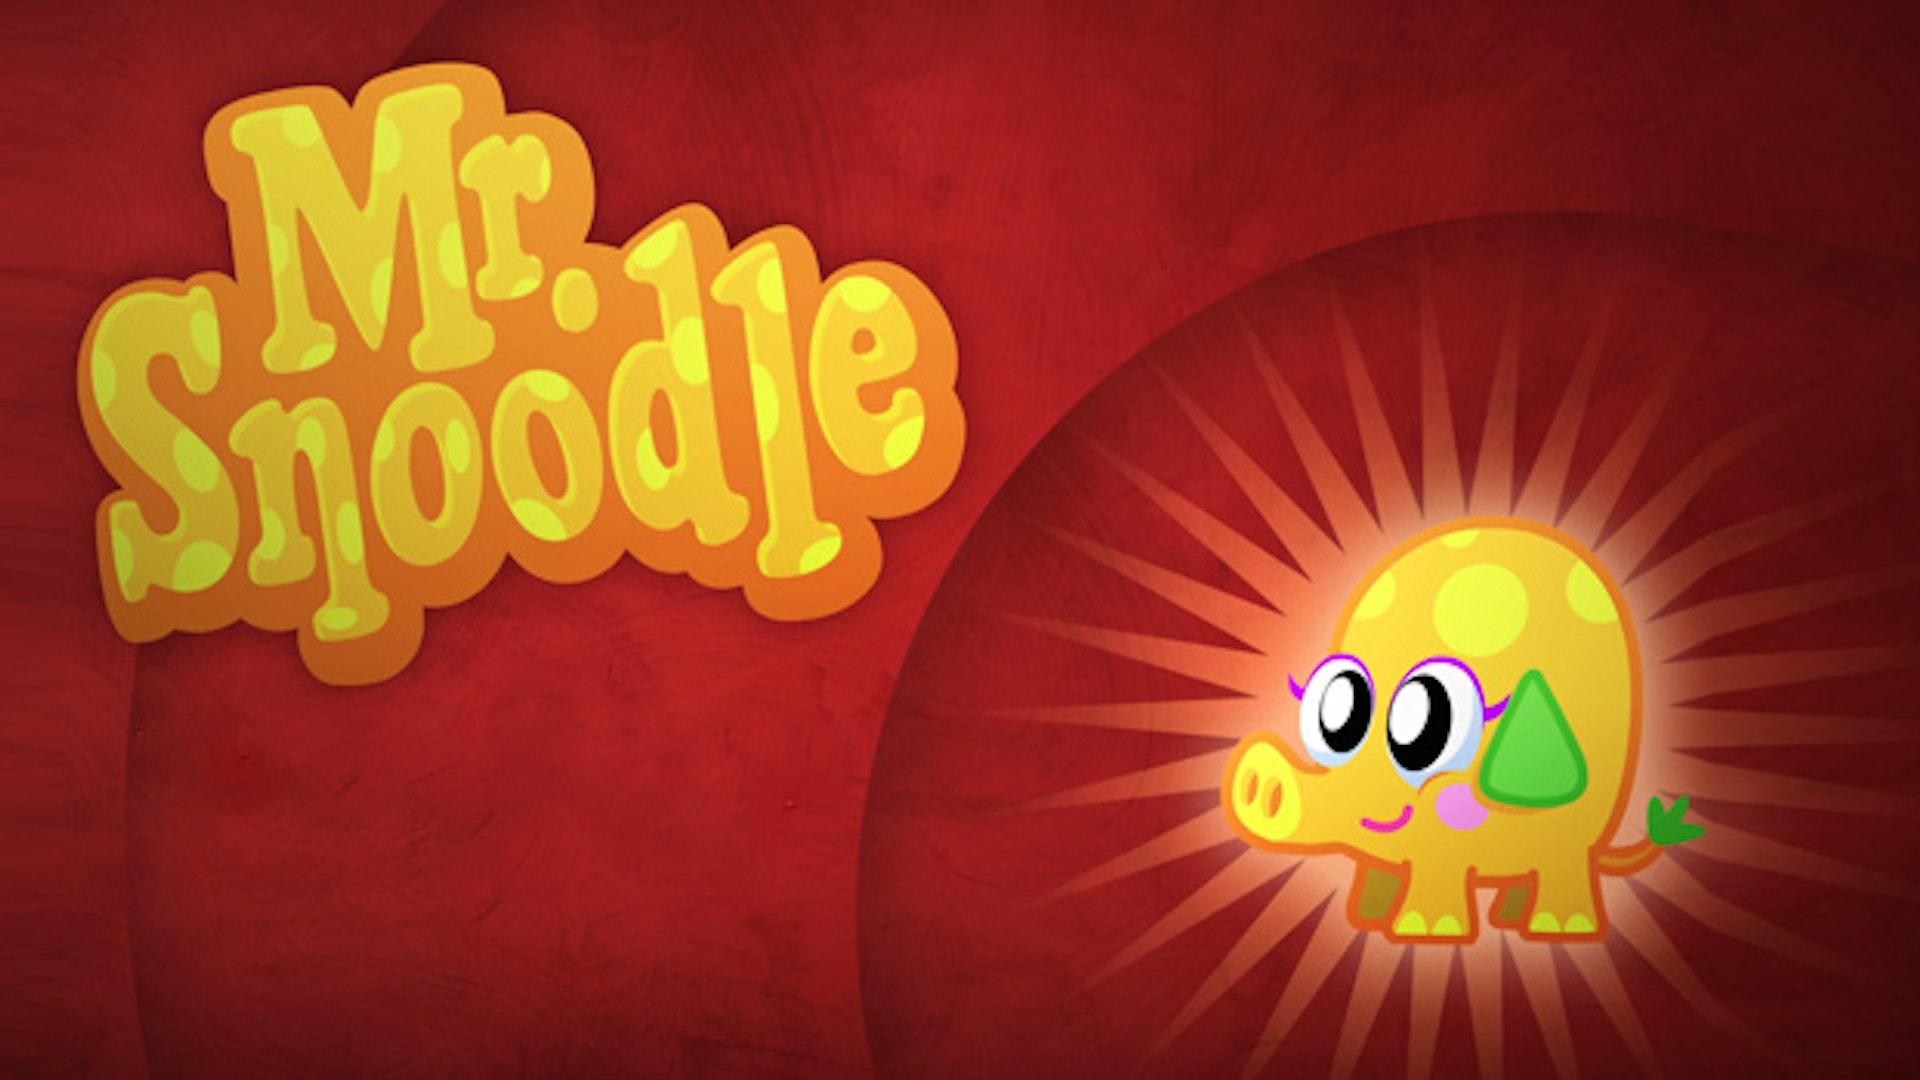 Mr Snoodle - 'Do The Doodle'